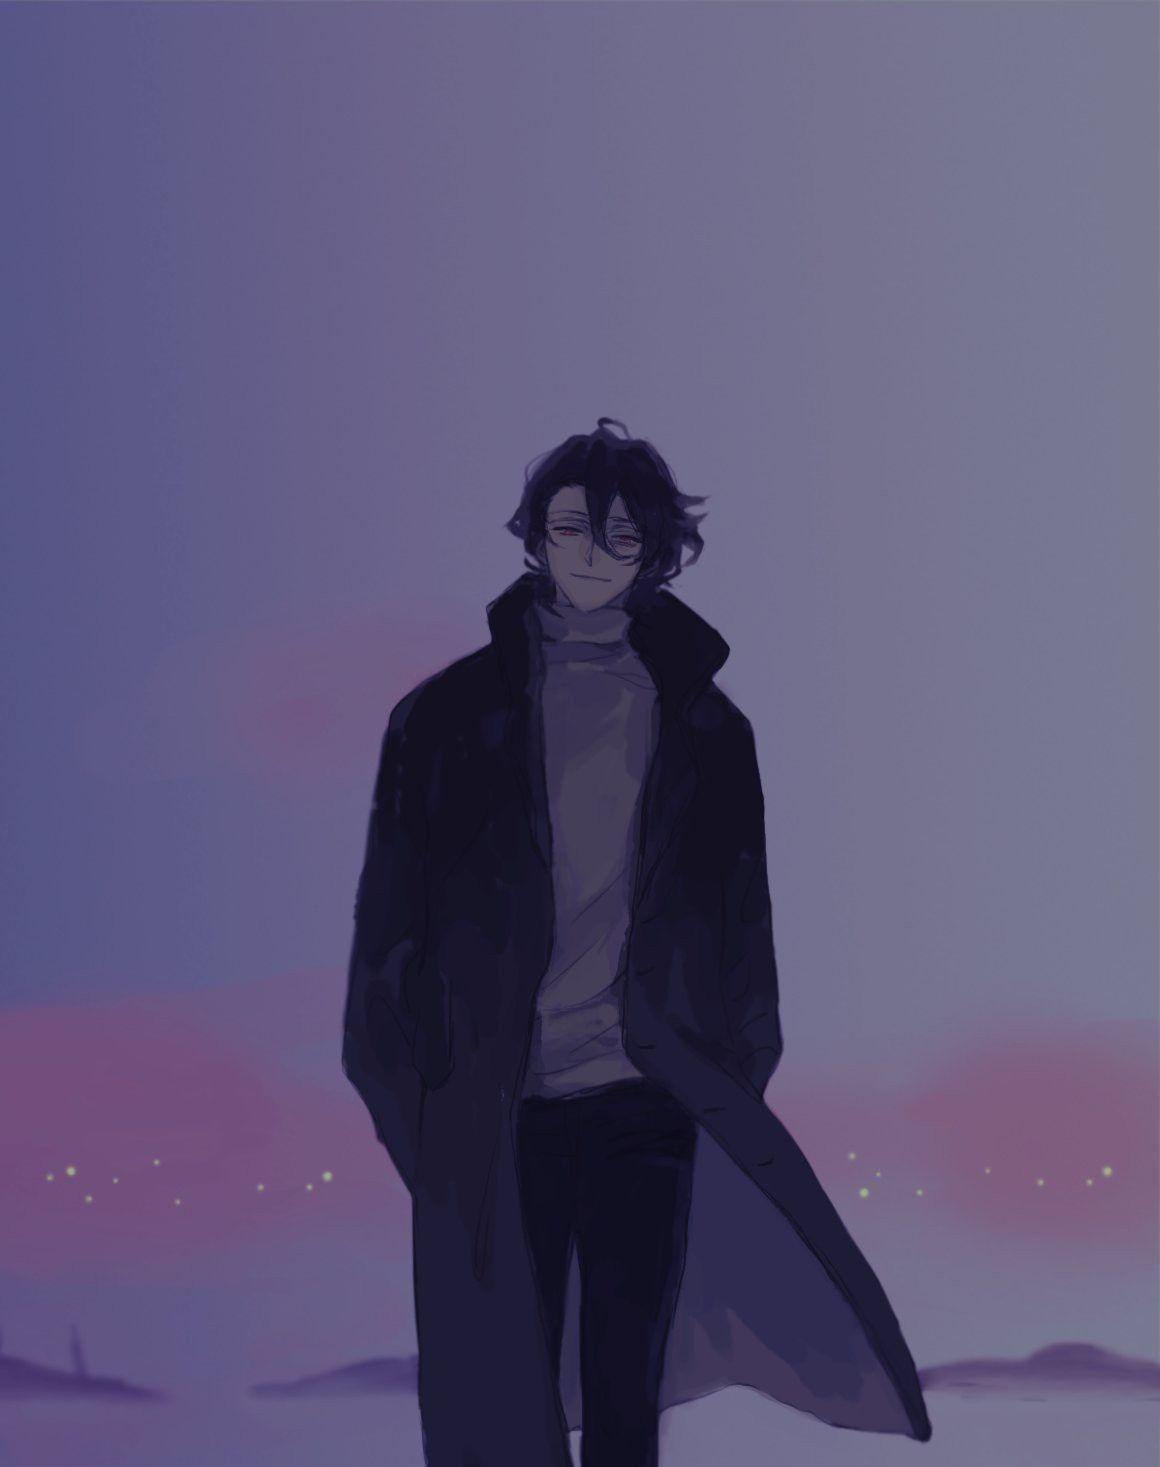 Leave Me And Go Leave Anime Boy Anime Art Aesthetic Anime